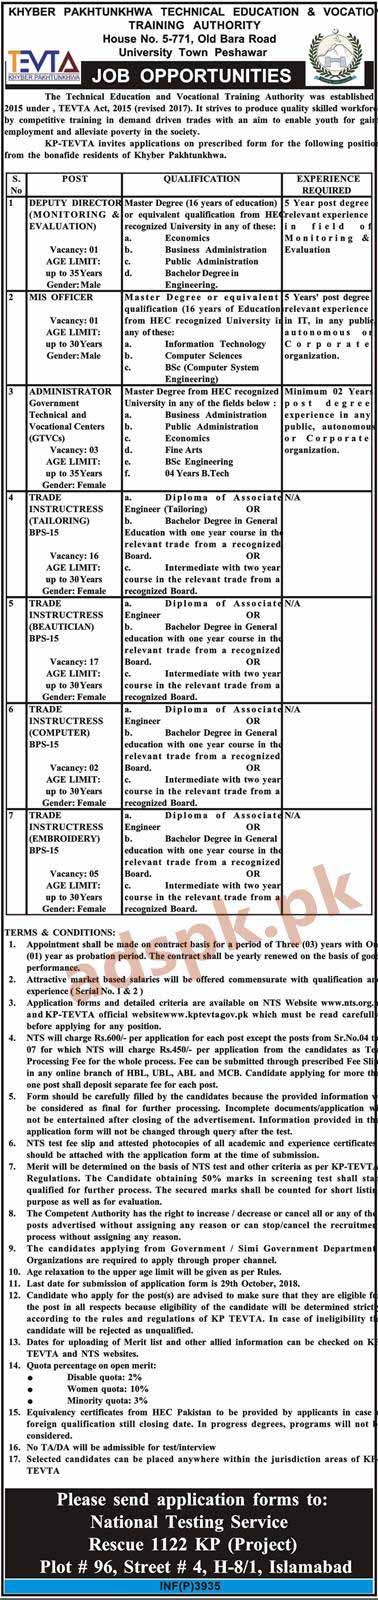 Khyber Pakhtunkhwa Technical Education & Vocational Training